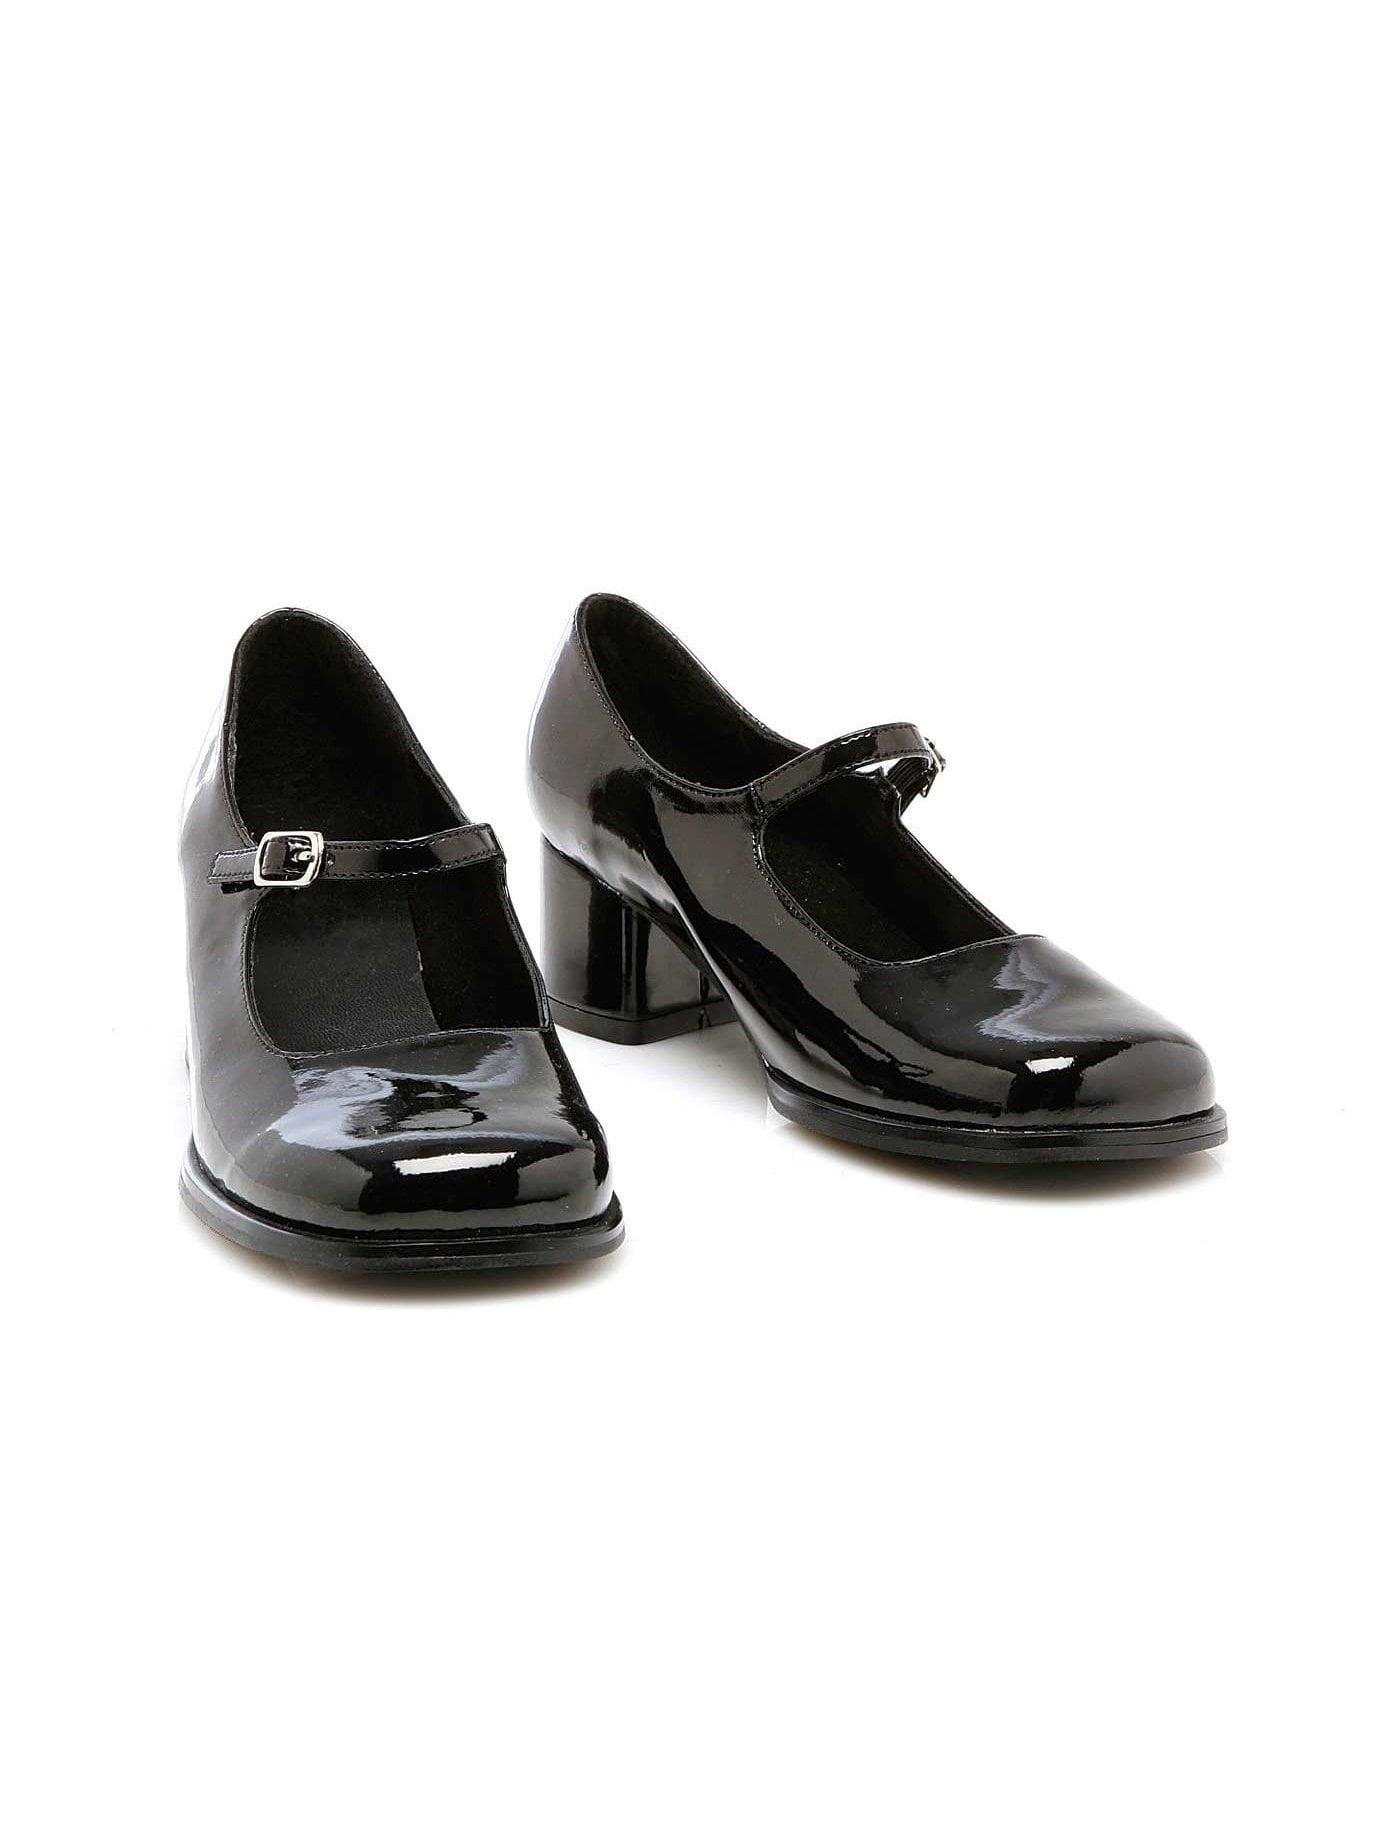 Ellie Shoes E-175-Eden 1 Heel Maryjane